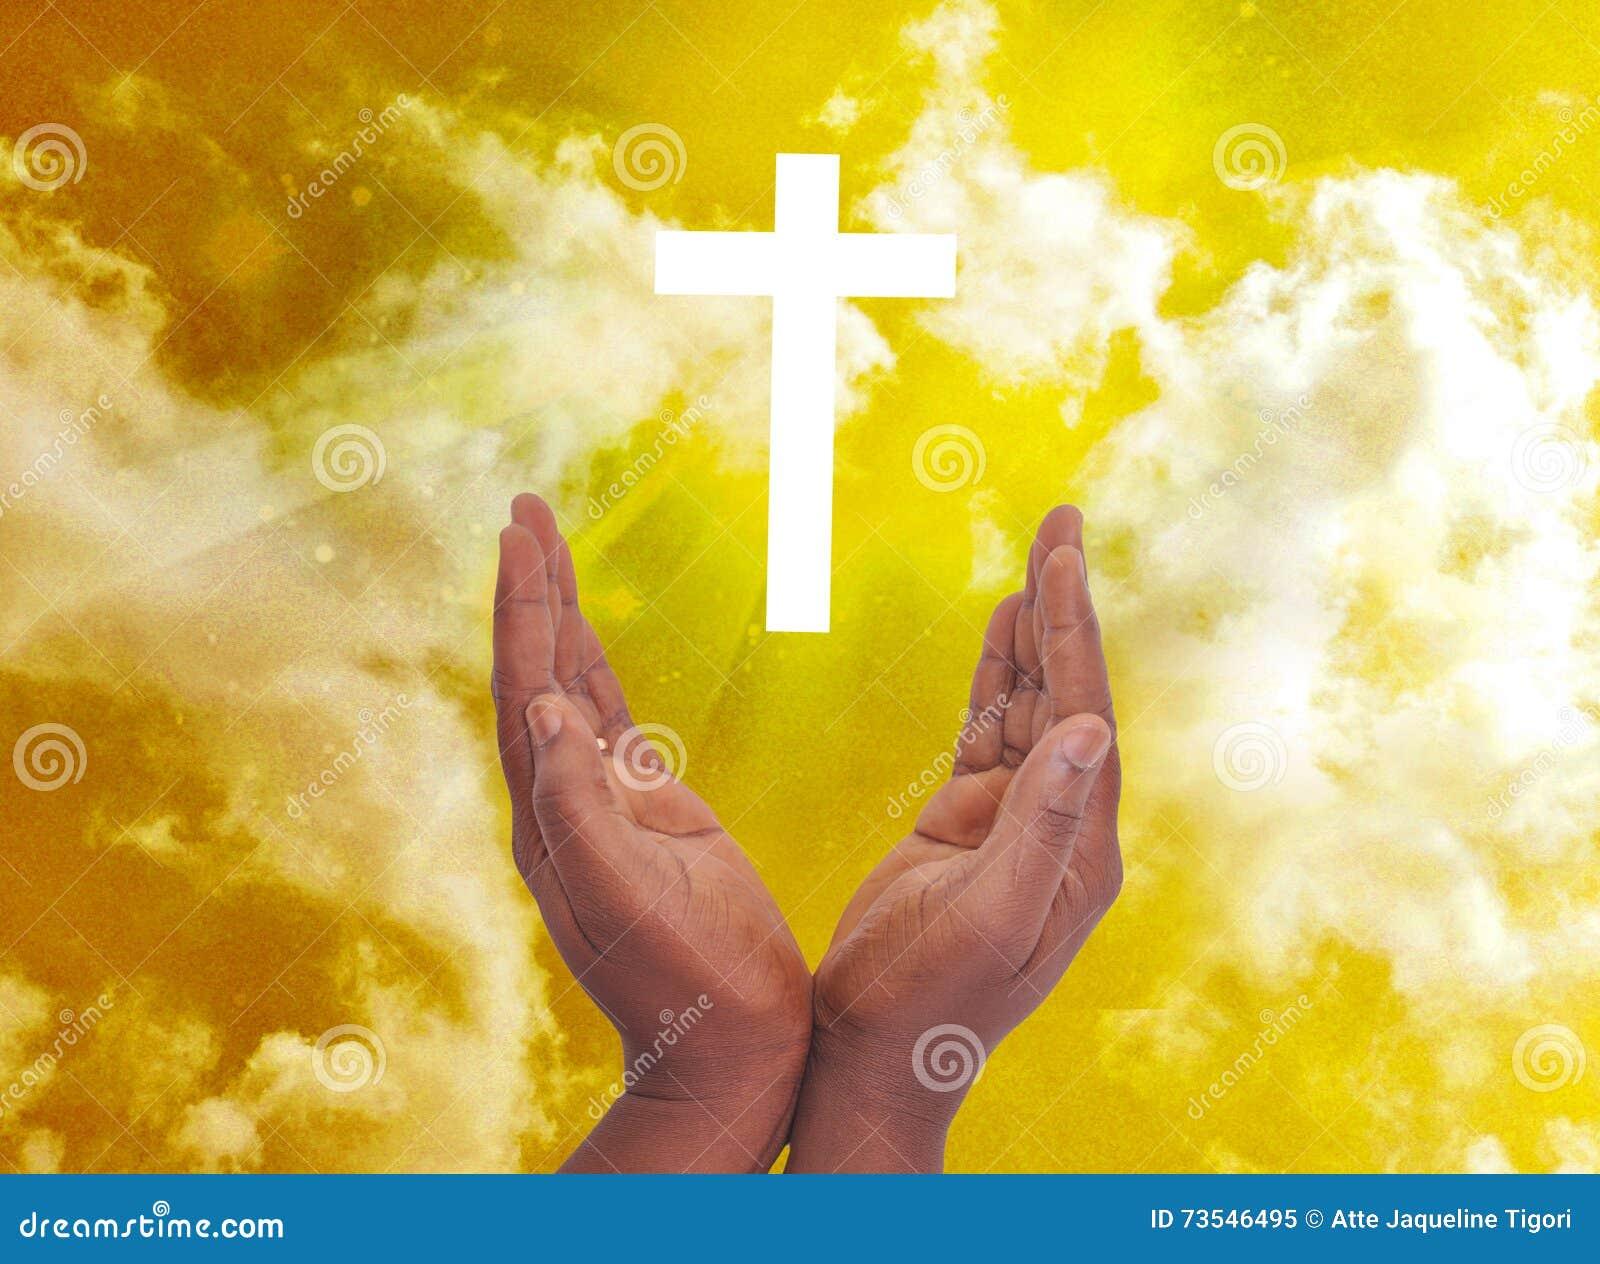 PRIVACY WITH SPIRITUAL CHRISTIAN CROSS